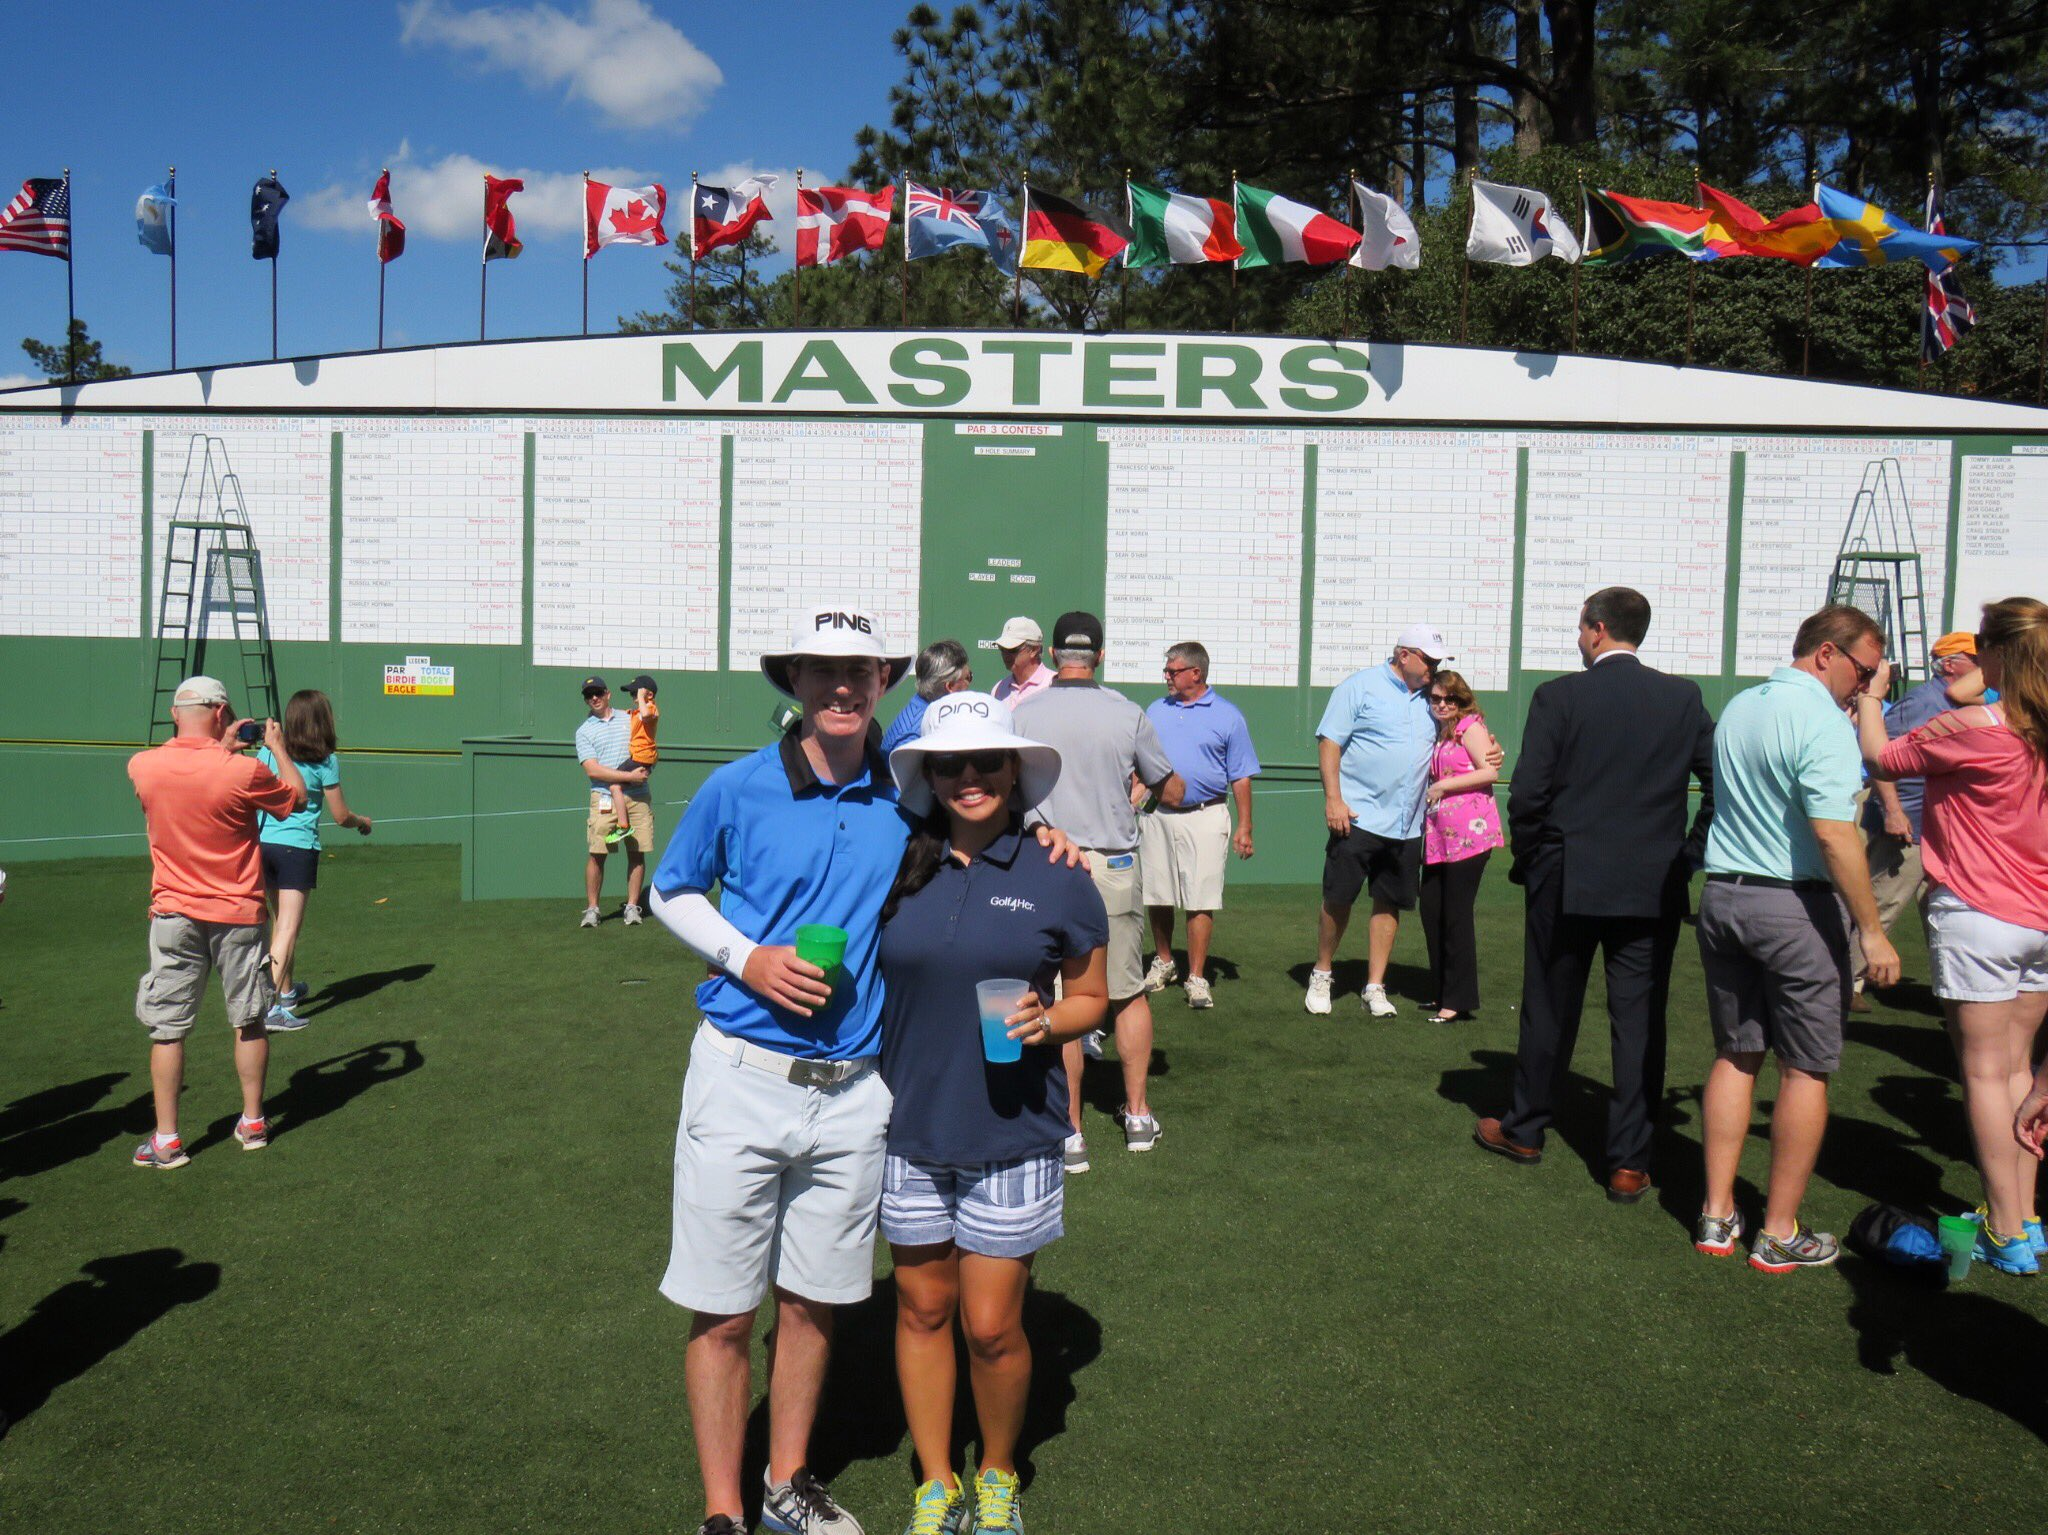 Thumbnail for LPGA Loves the Masters